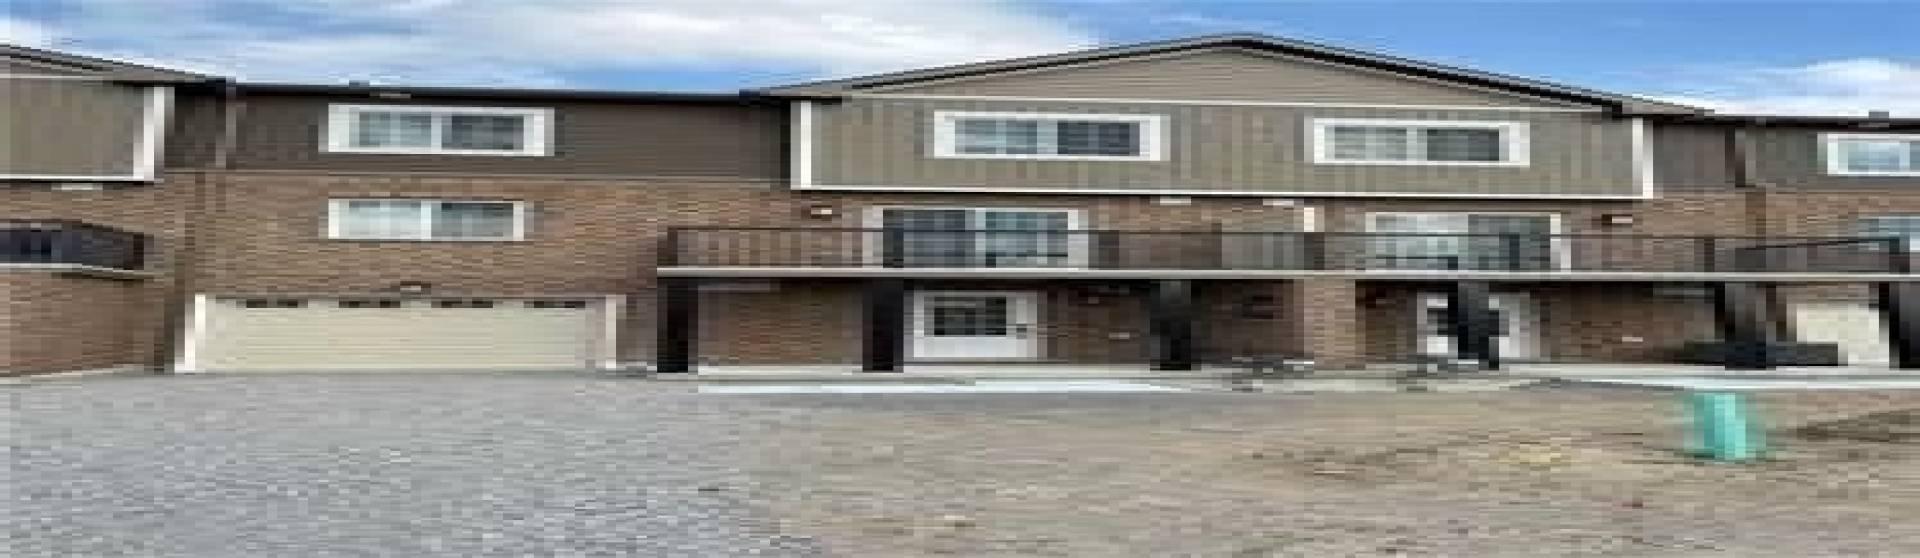 49 Kodiak Terr- Barrie- Ontario L9J0J4, 2 Bedrooms Bedrooms, 8 Rooms Rooms,2 BathroomsBathrooms,Att/row/twnhouse,Lease,Kodiak,S4813096